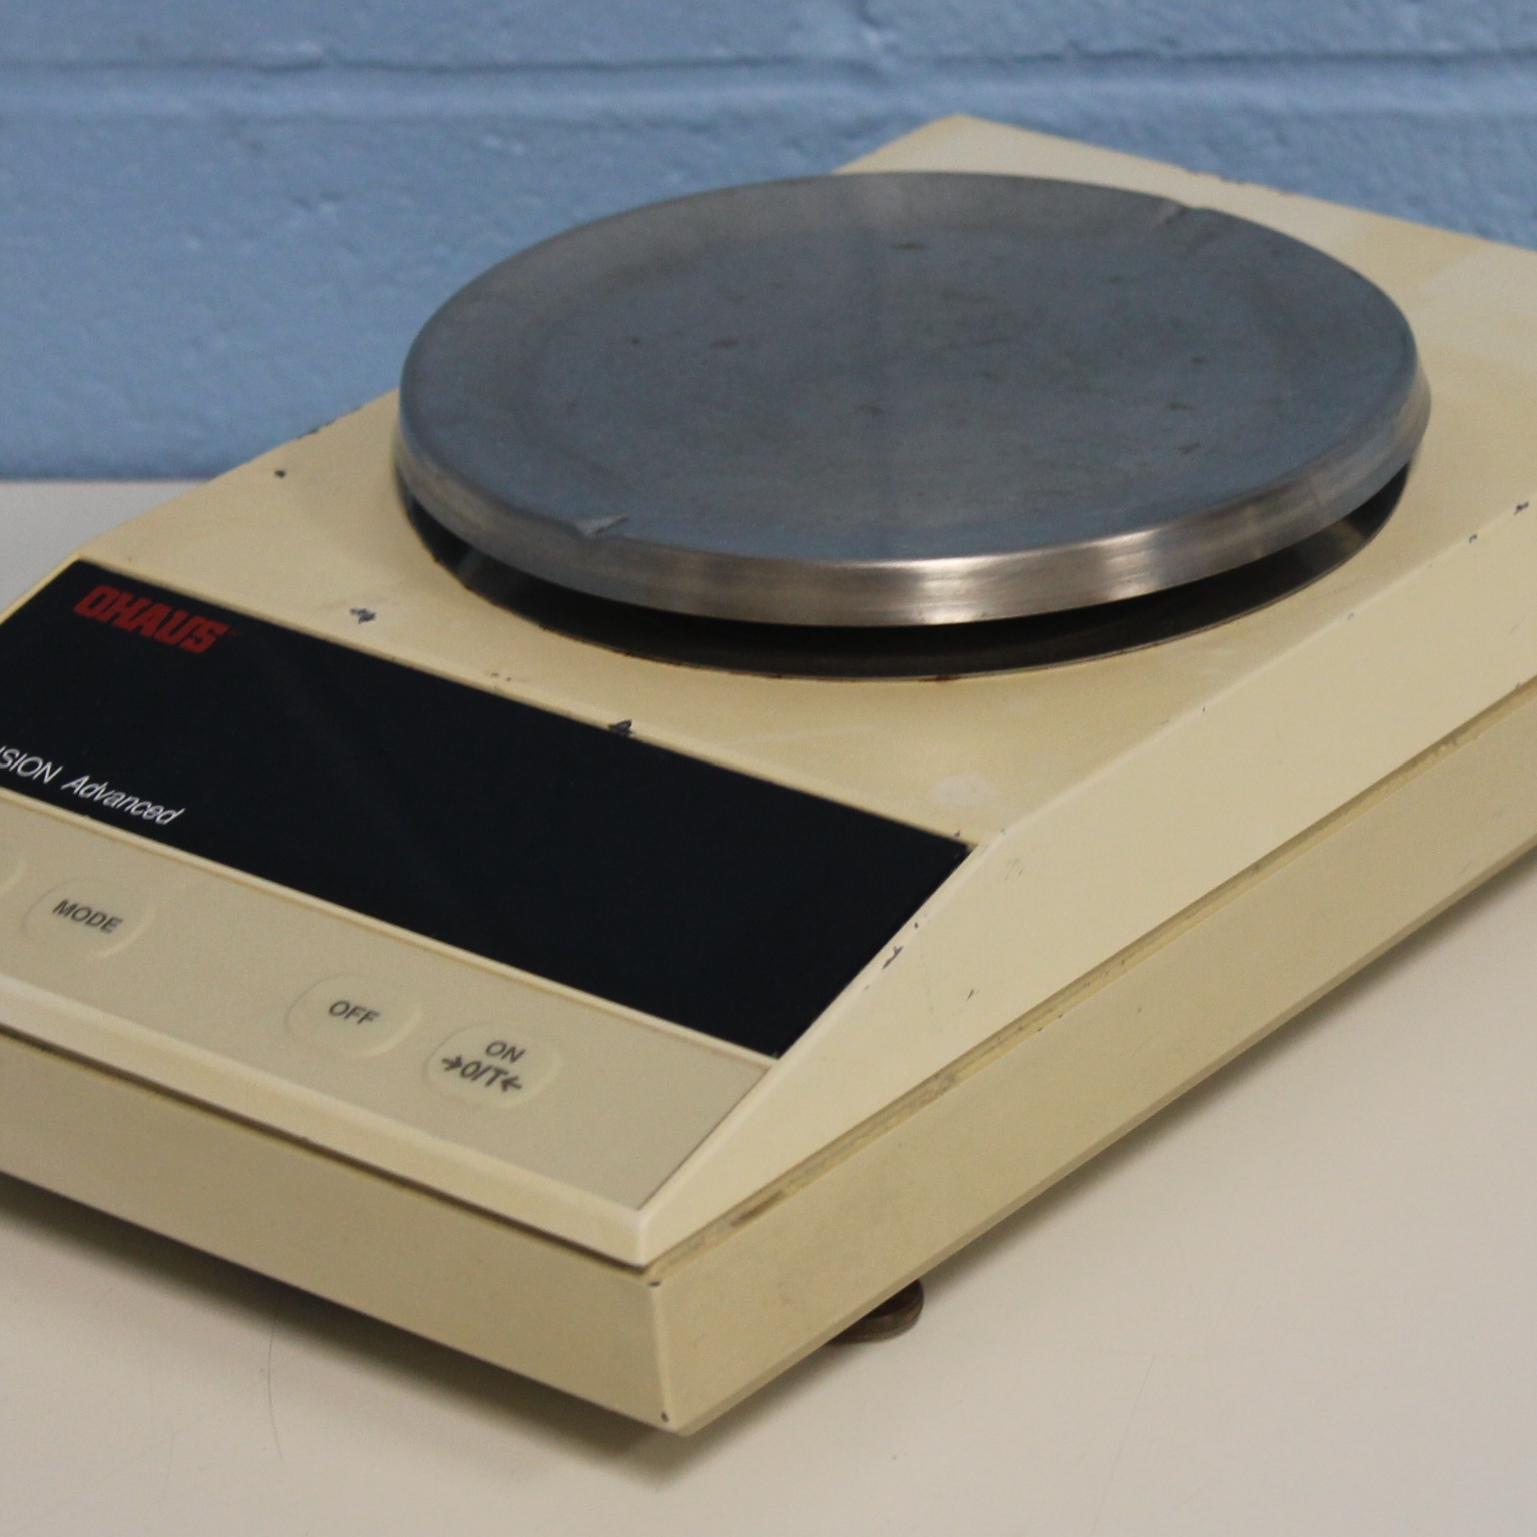 Ohaus Precision Advanced GT4100 Balance Image